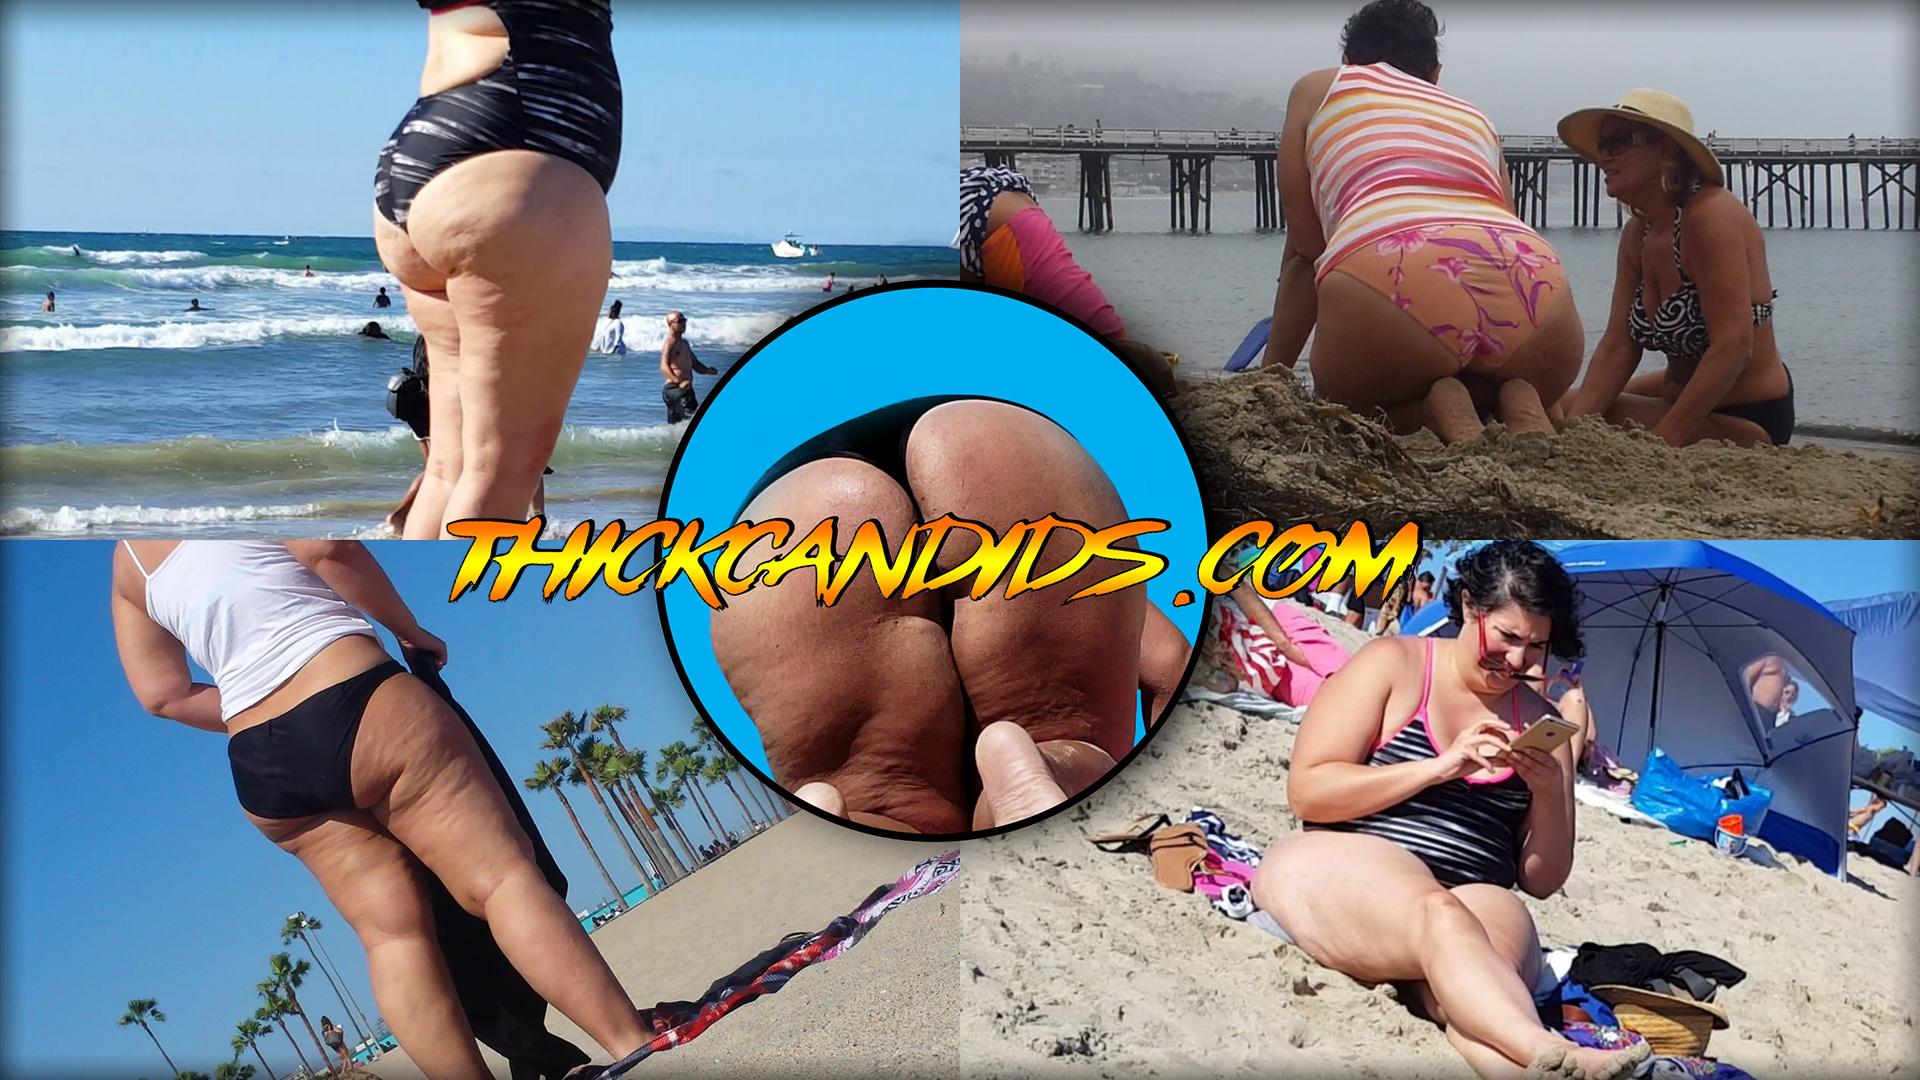 Thickcandids_Gallery_4